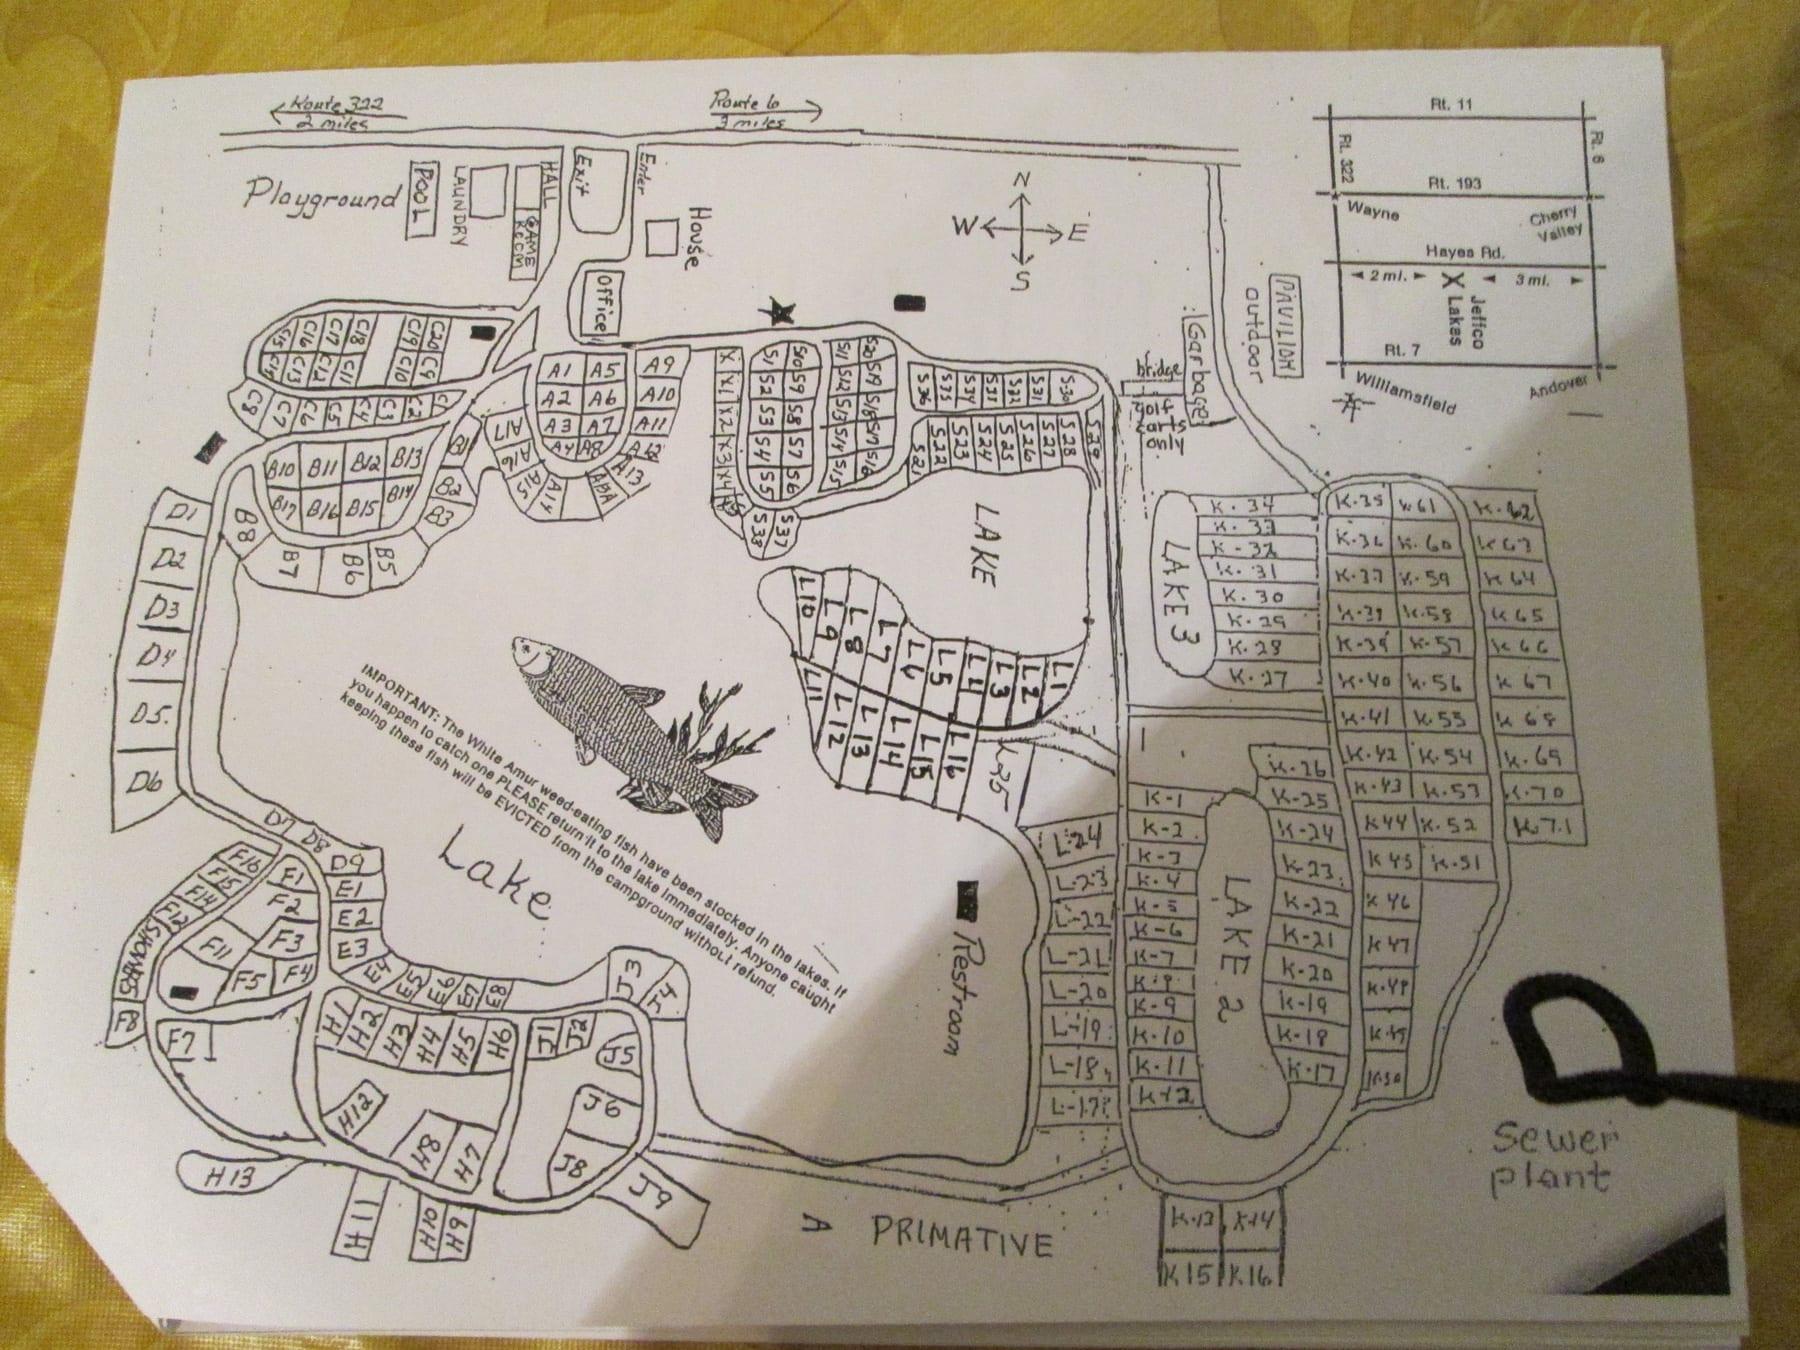 Map-Jeffco-proper